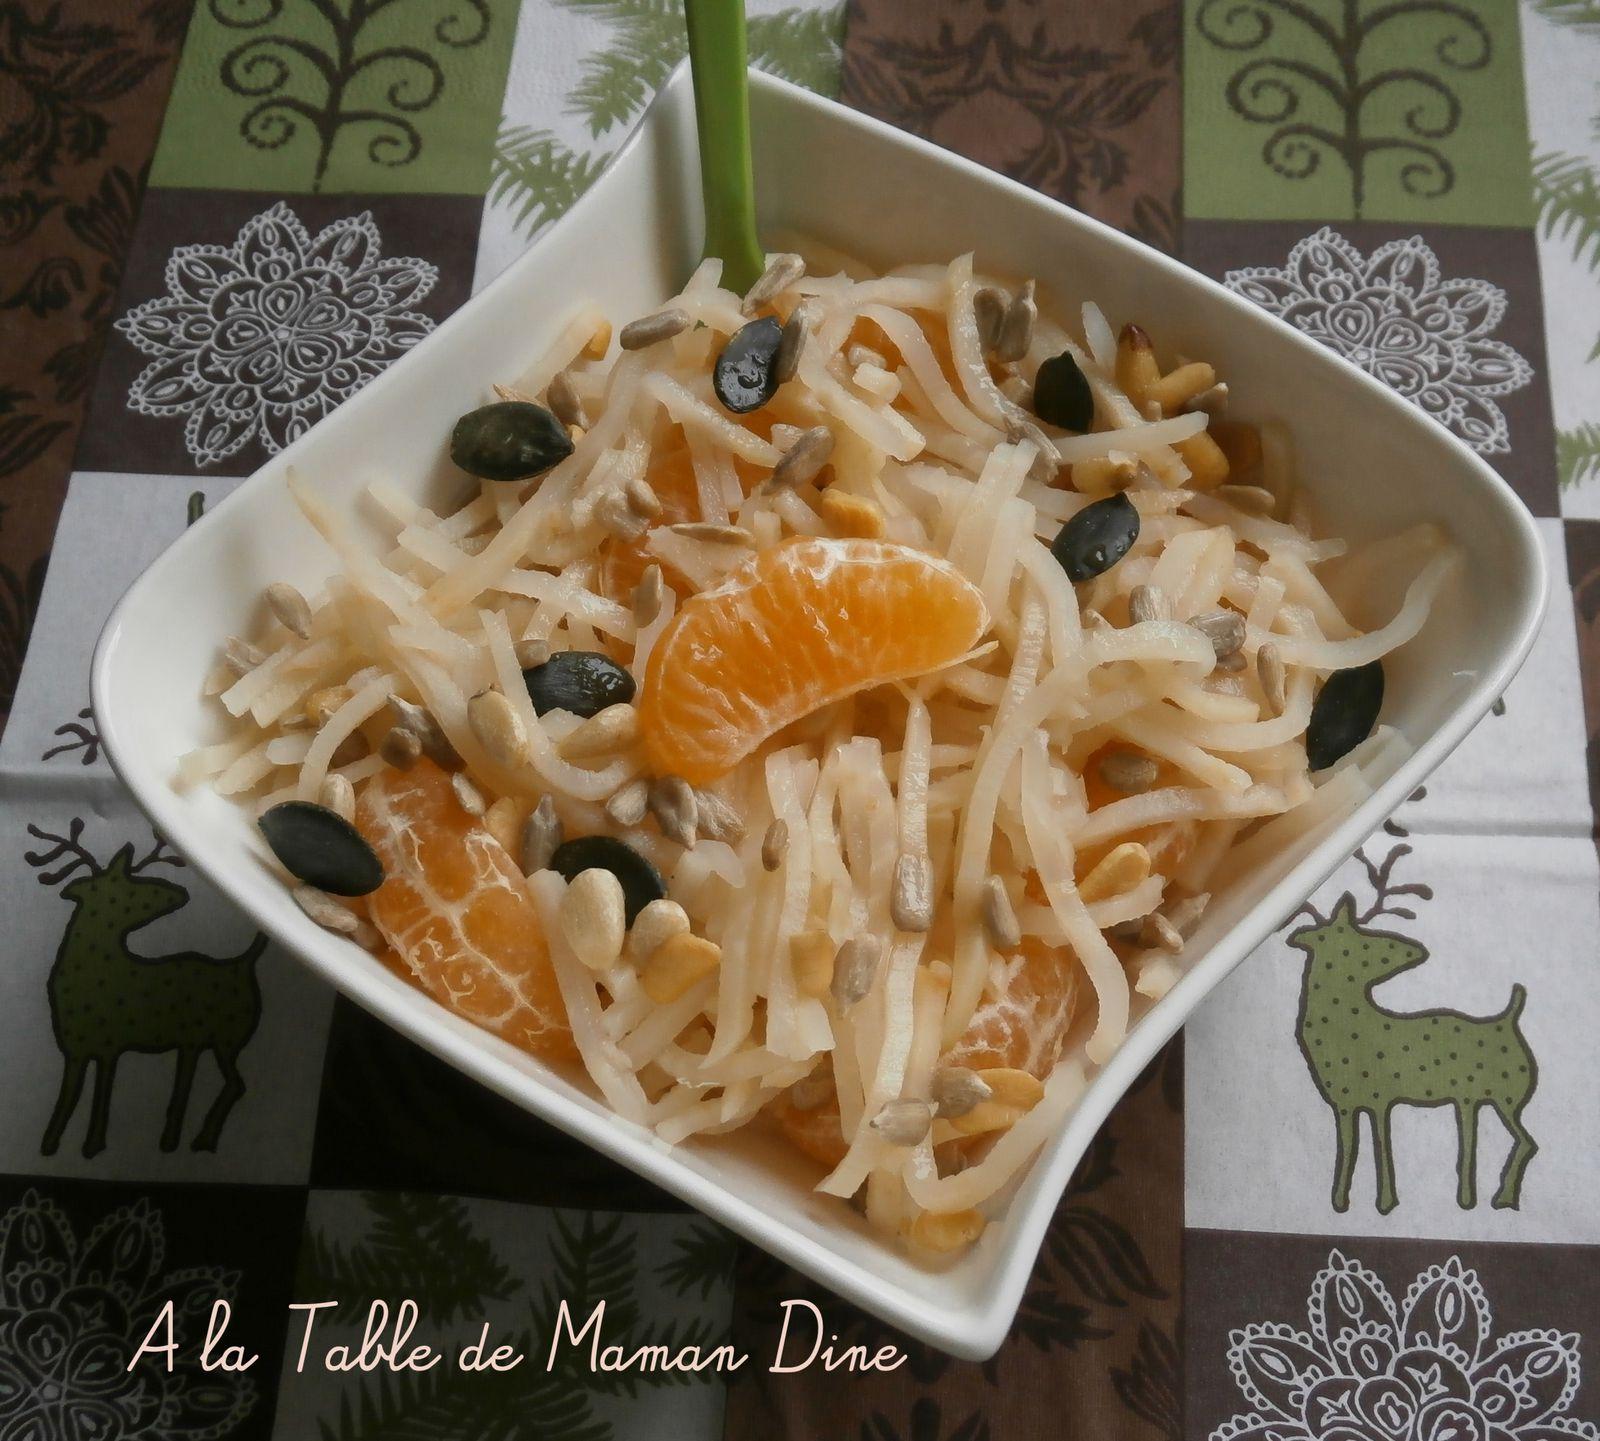 Salade automnale de céleri rave & clémentine